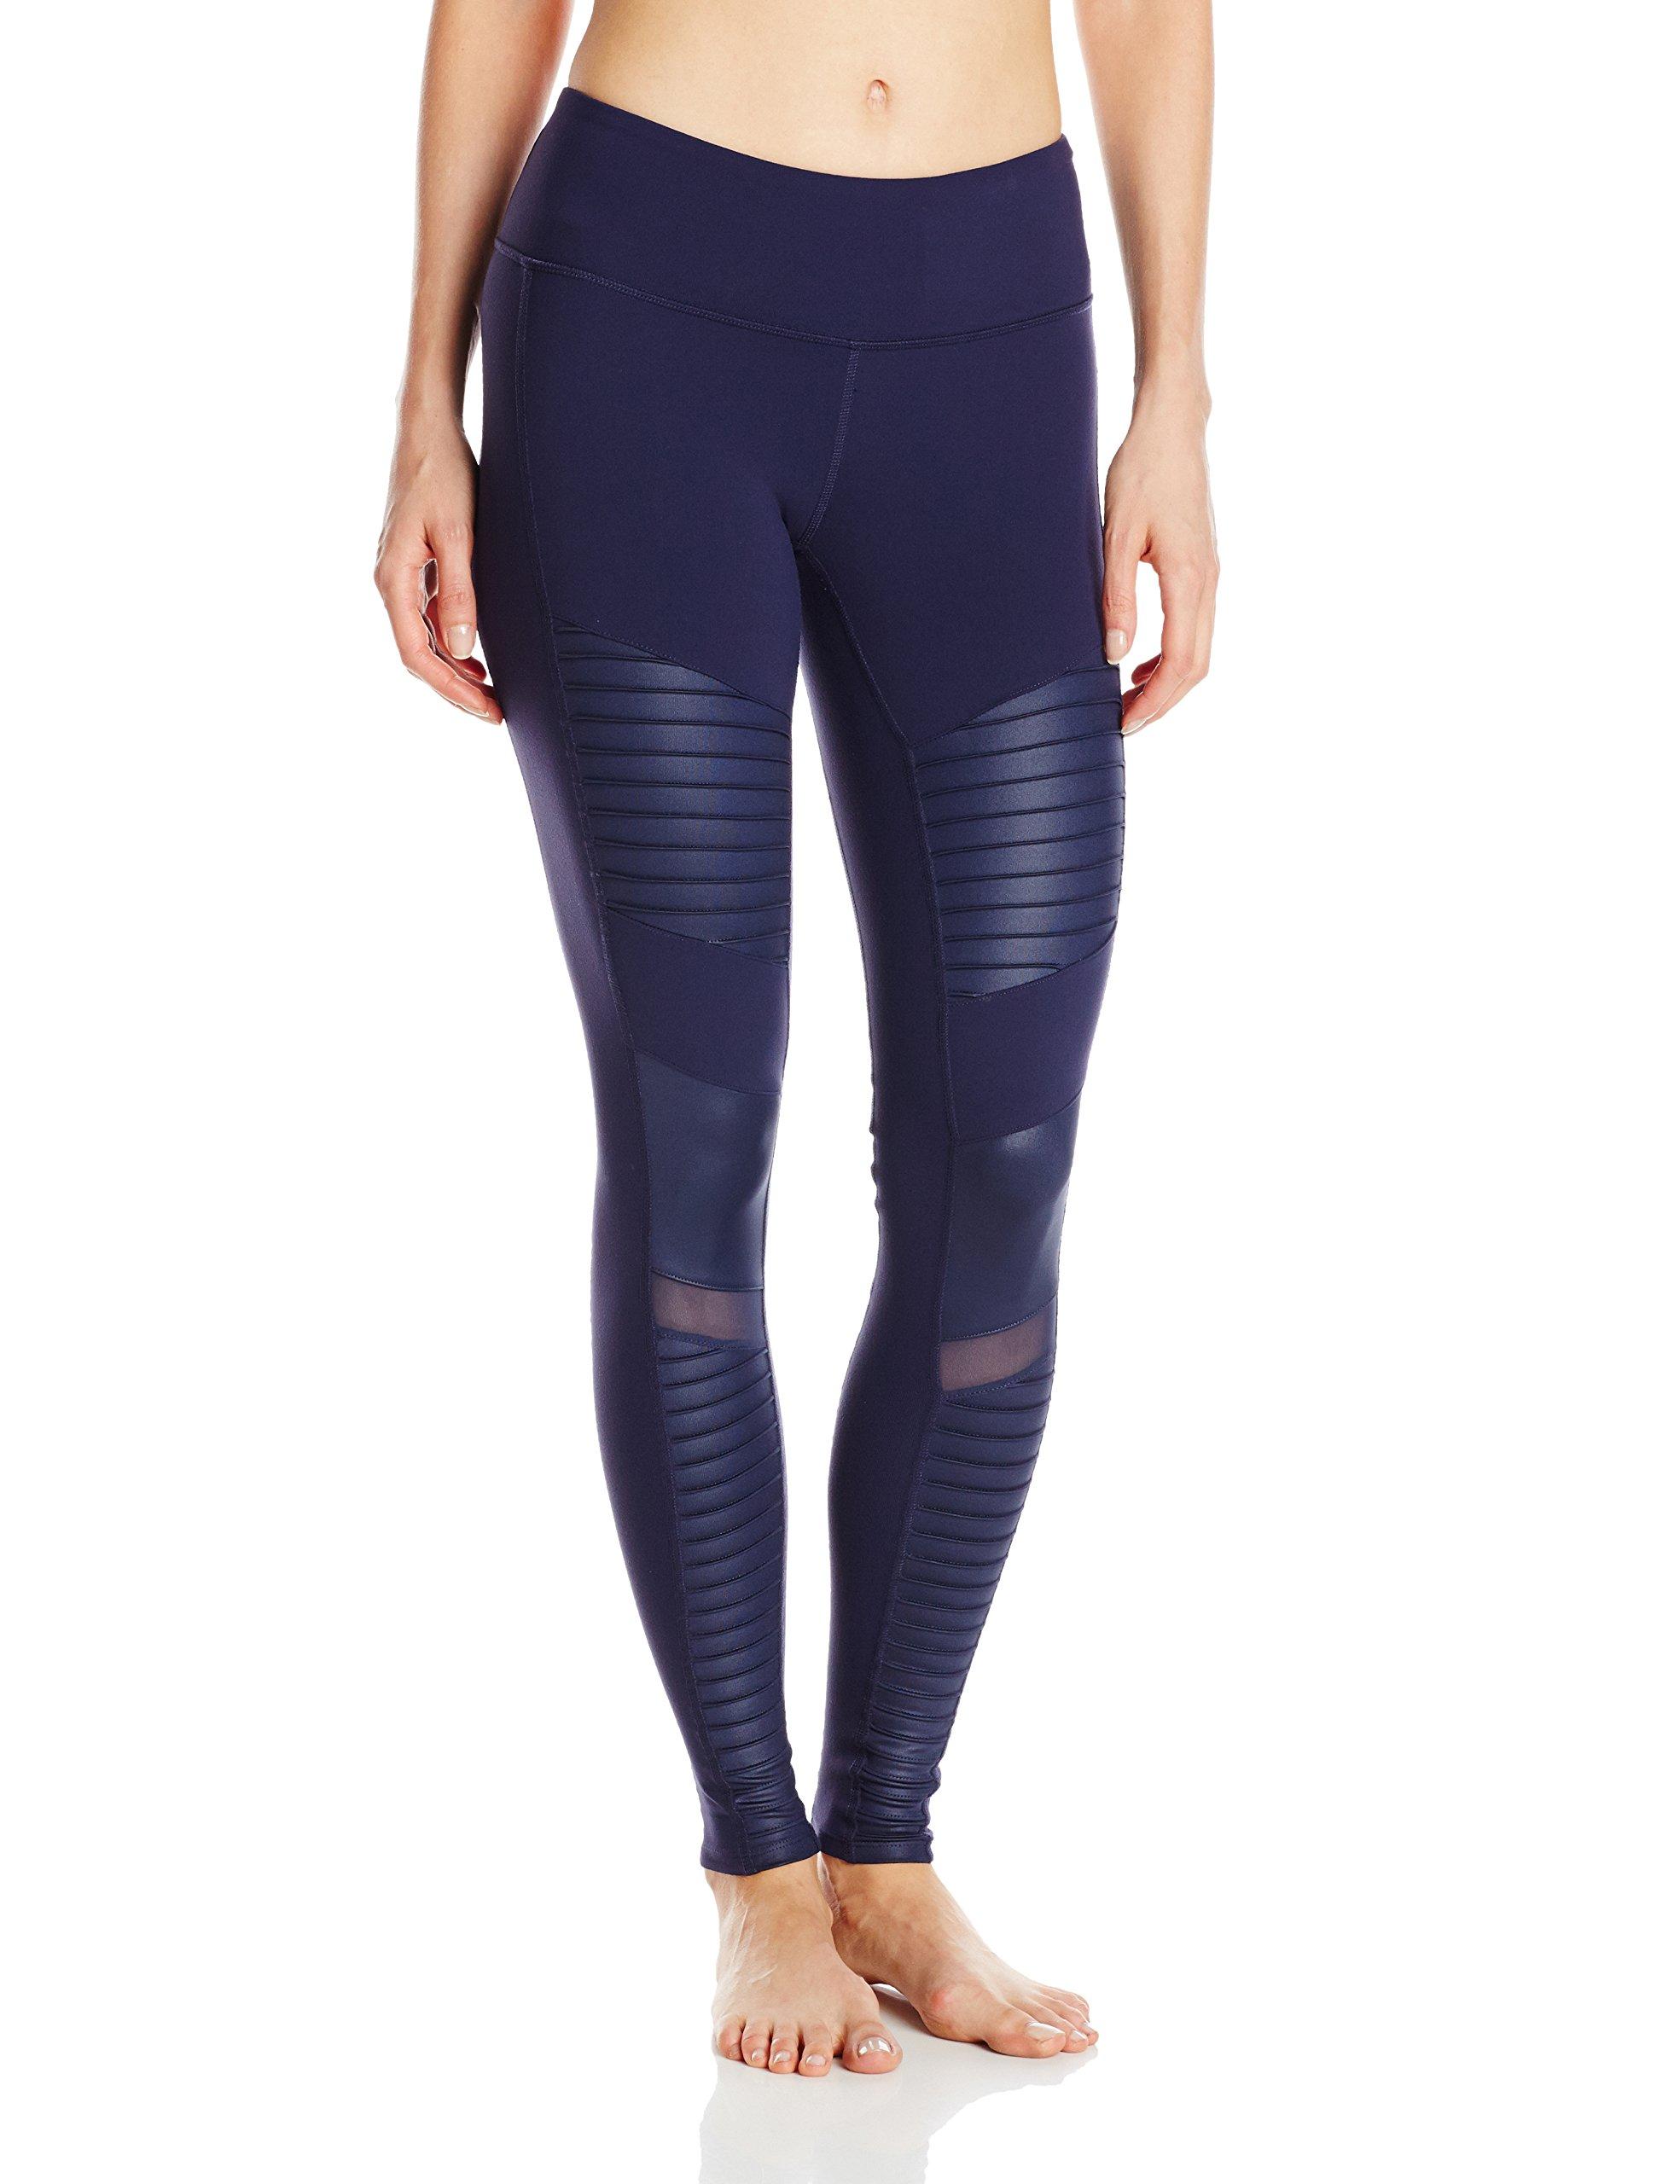 Alo Yoga Women's Moto Legging Pants, Rich Navy/Rich Navy Glossy, S